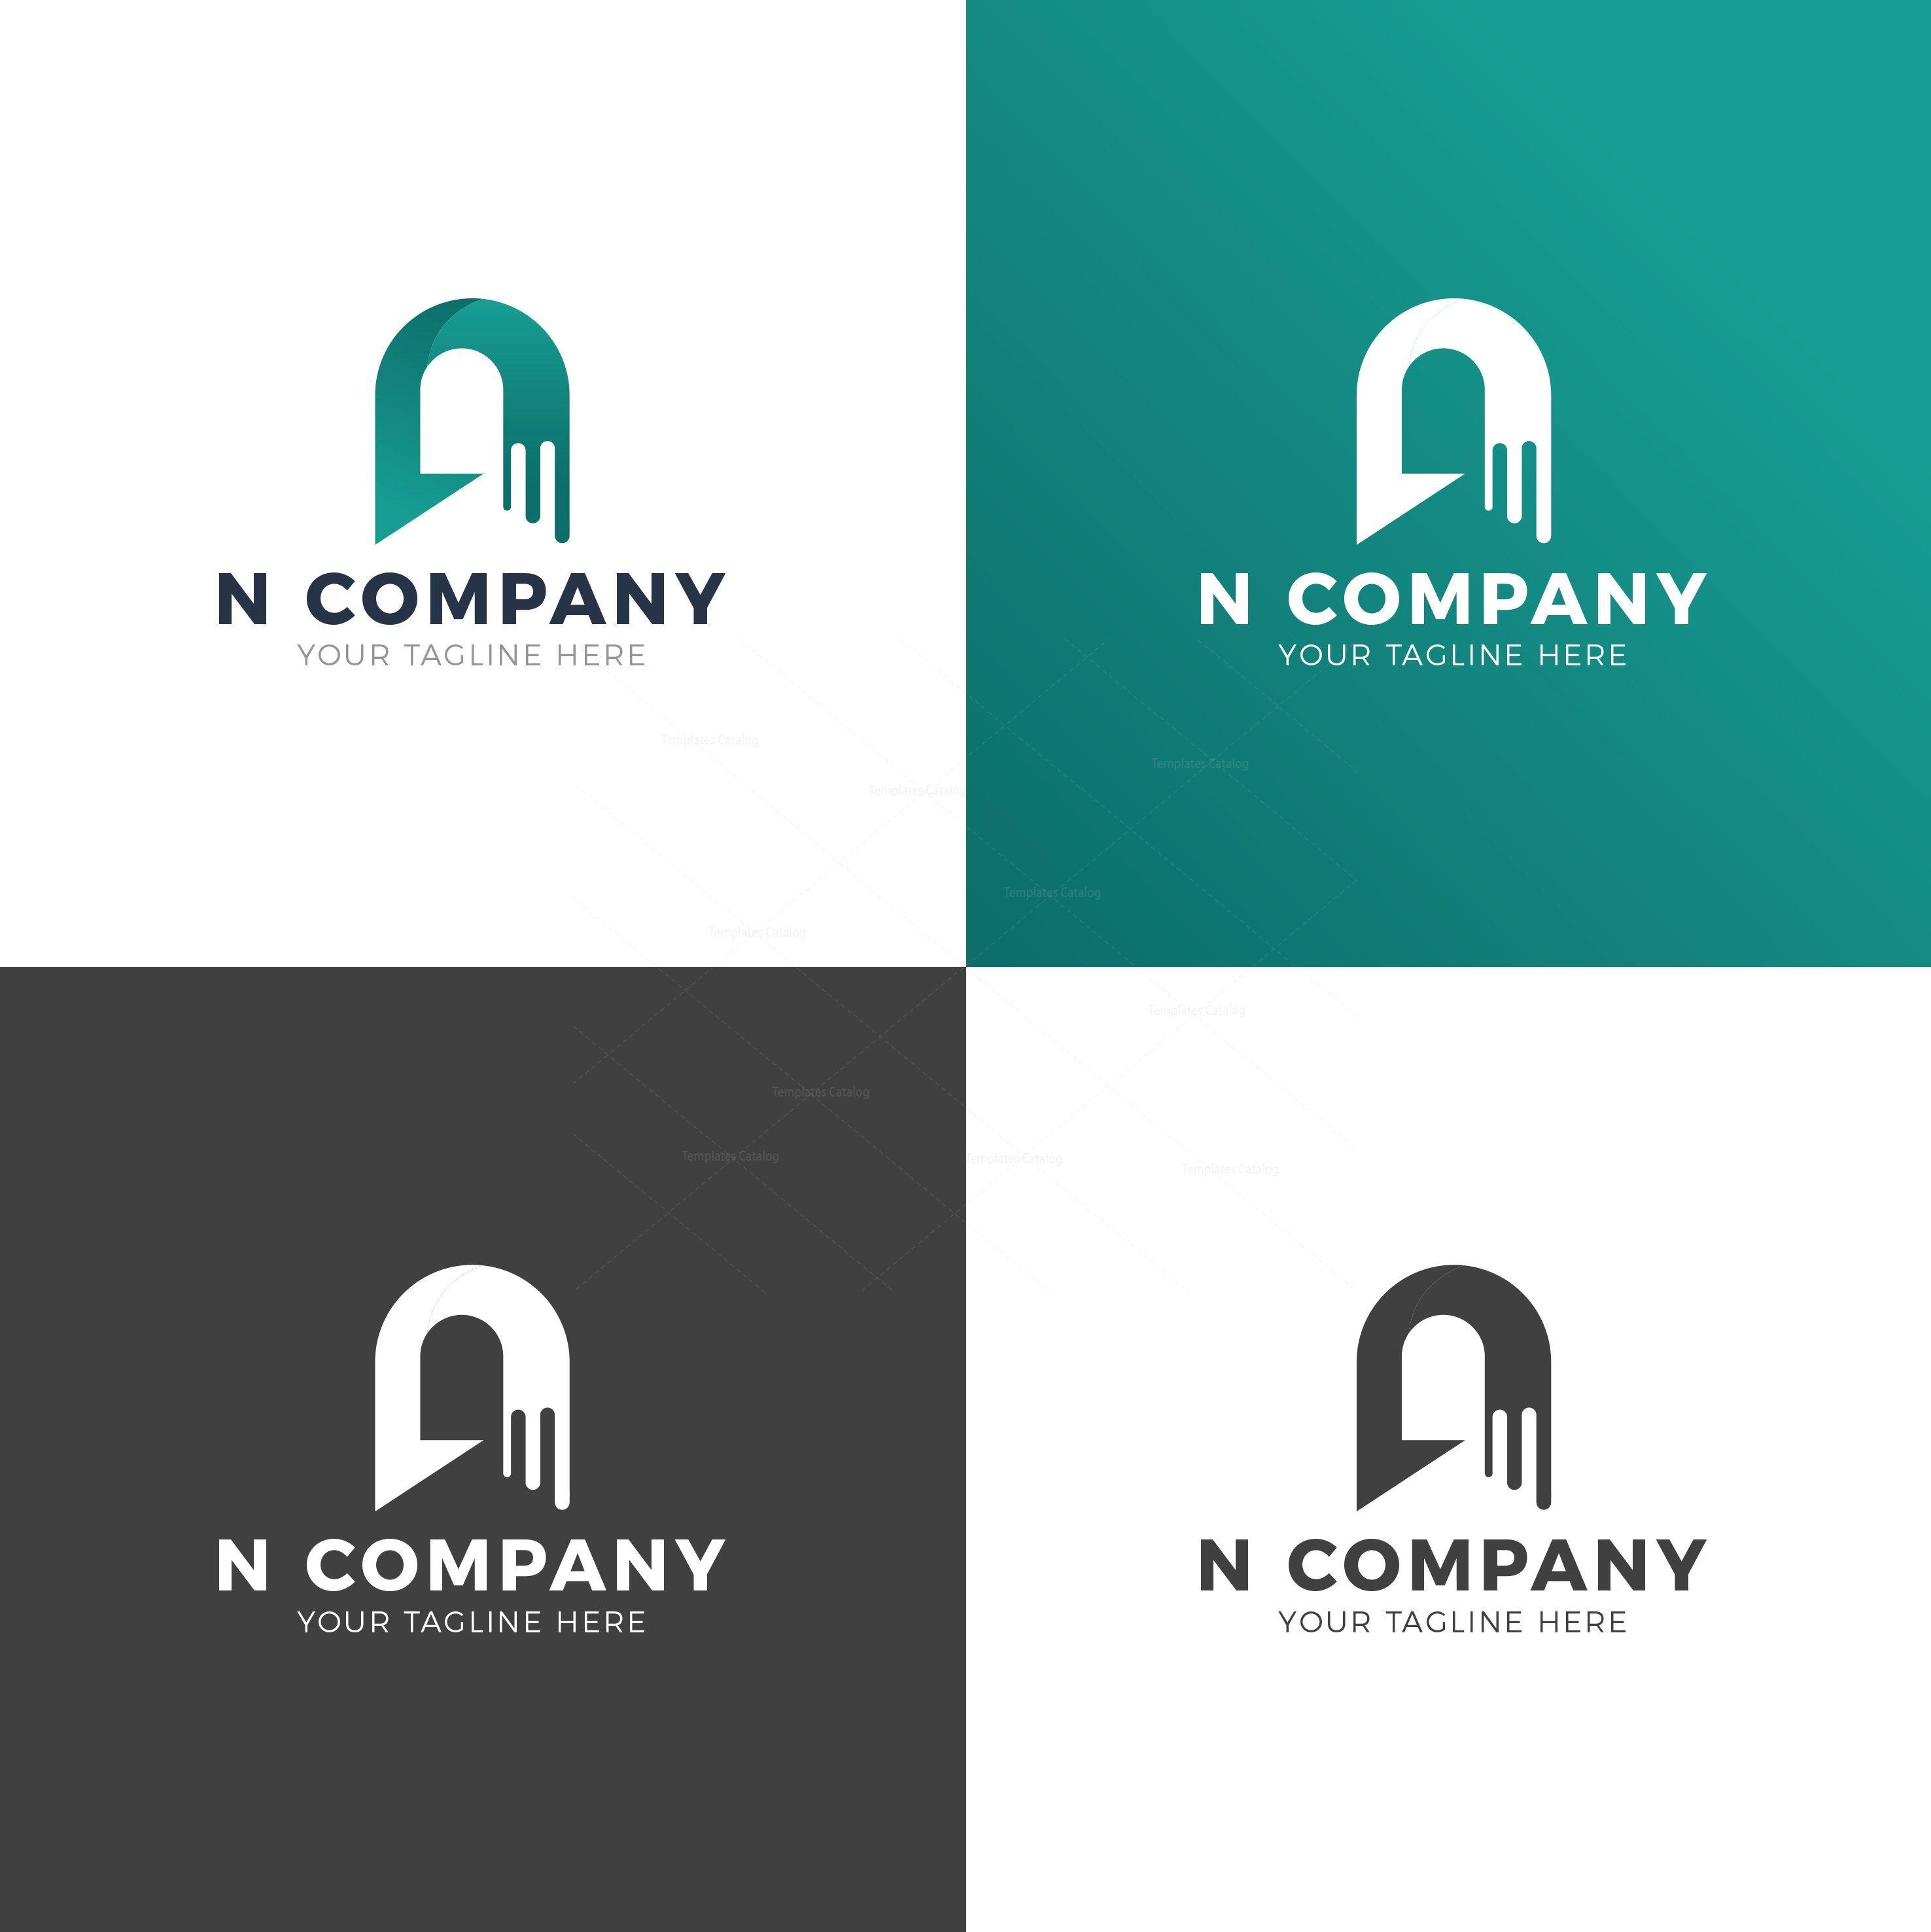 N Company Professional Logo Design Template 001926 Logo